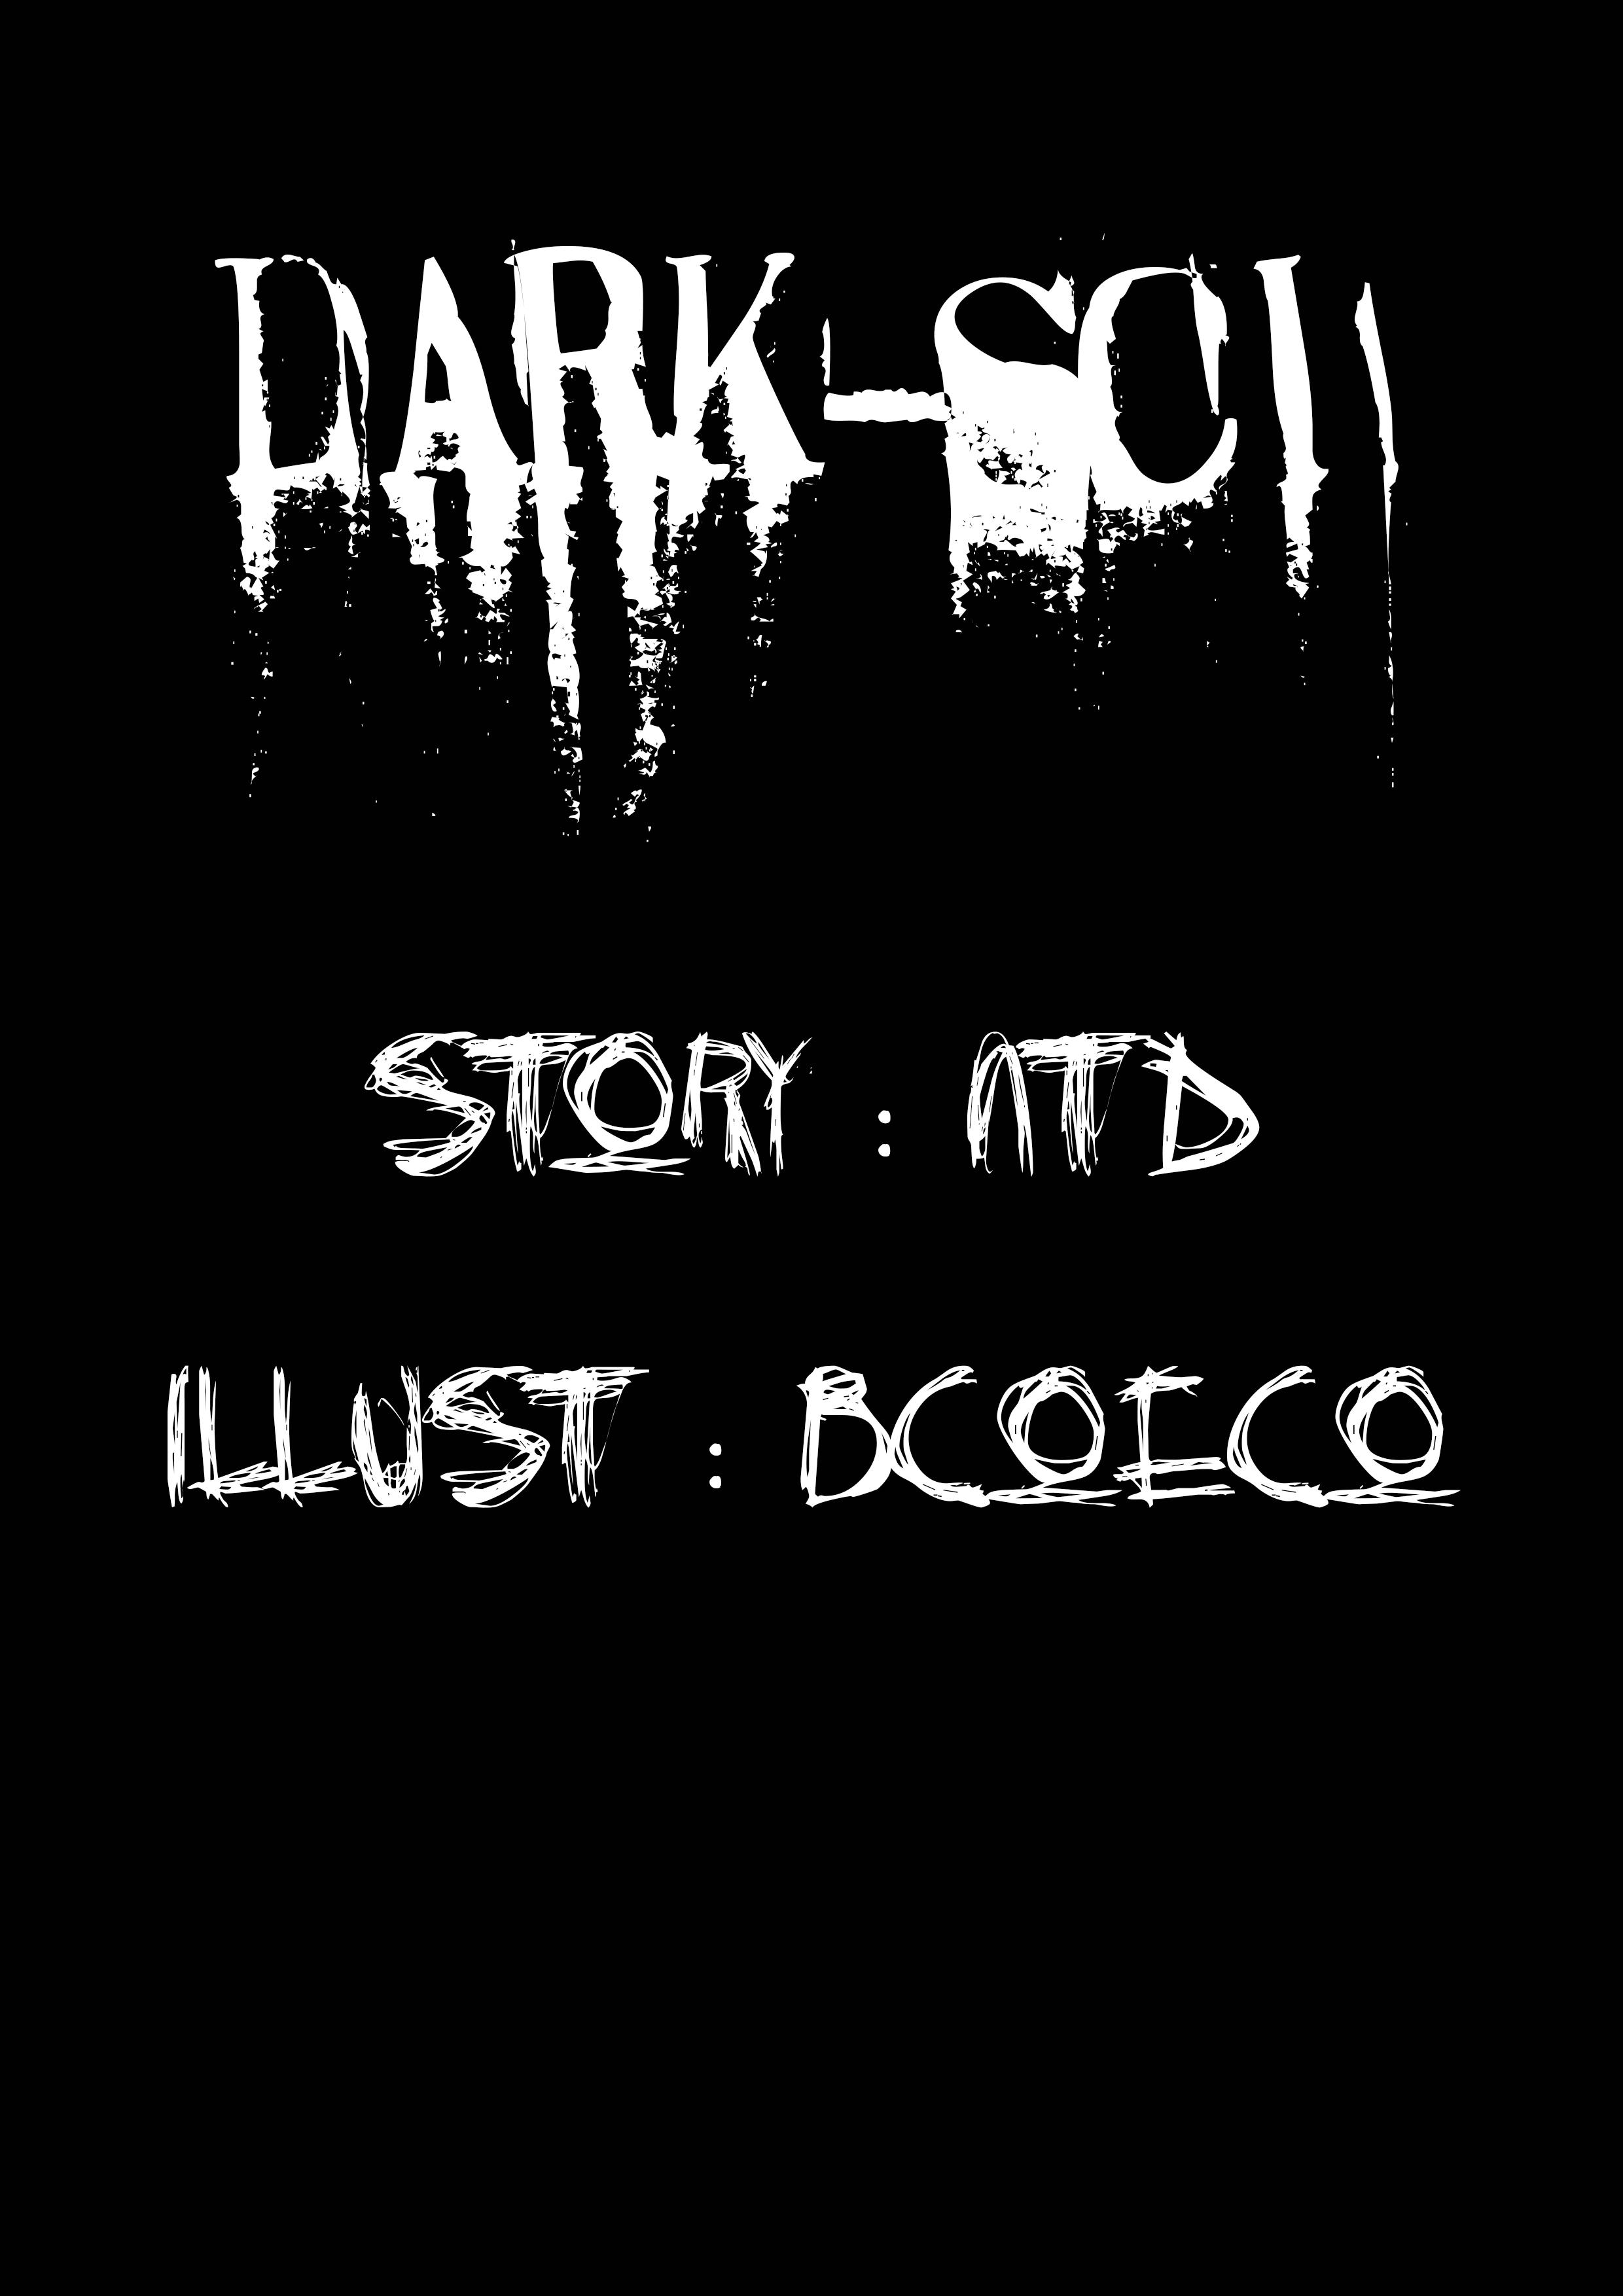 Dark - Sci - เด็กหนุ่ม